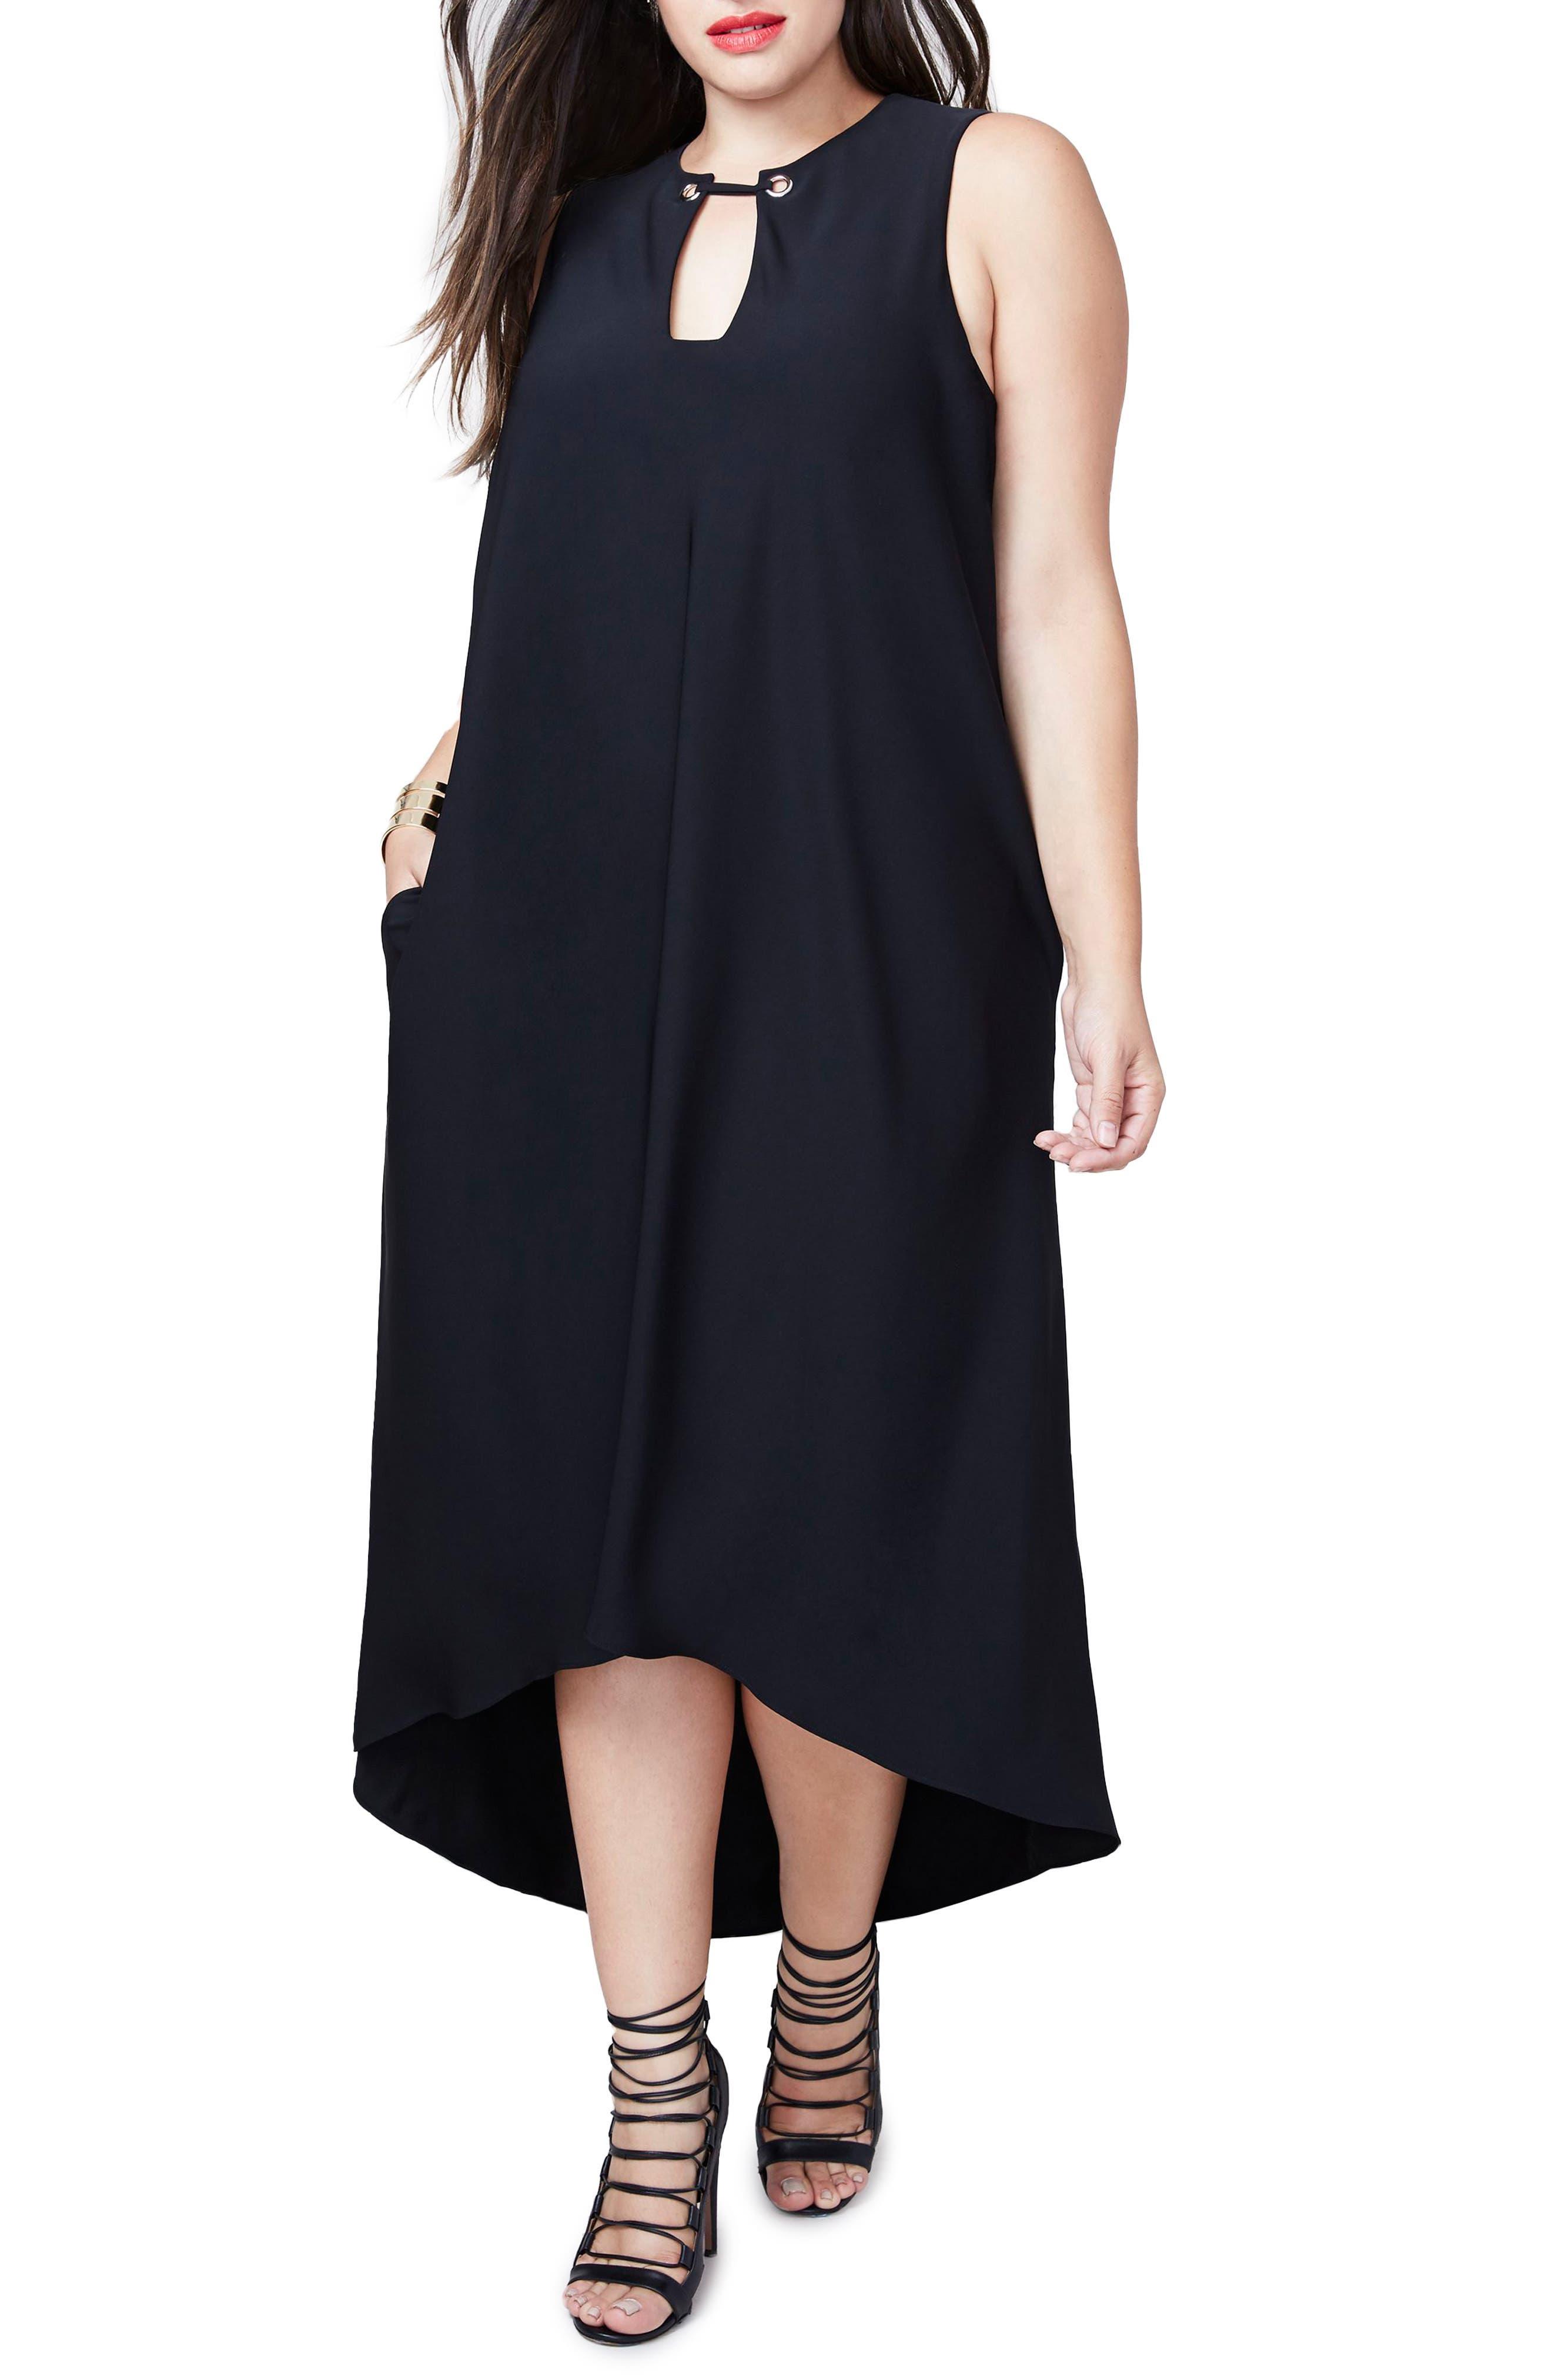 RACHEL Rachel Roy Elliptical Hem Shift Dress,                         Main,                         color, 001